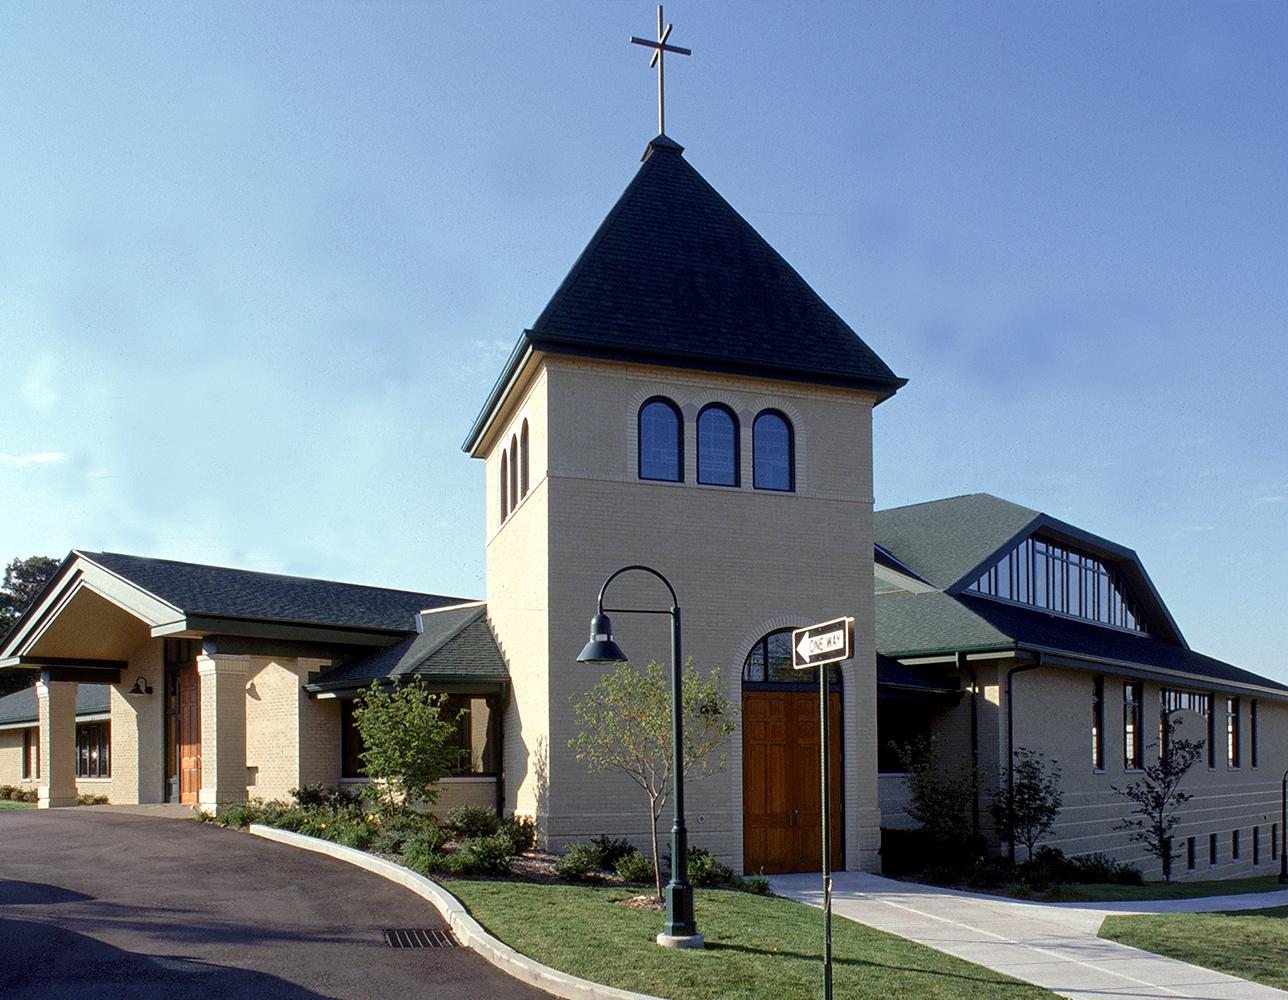 ST. BONAVENTURE CATHOLIC CHURCH